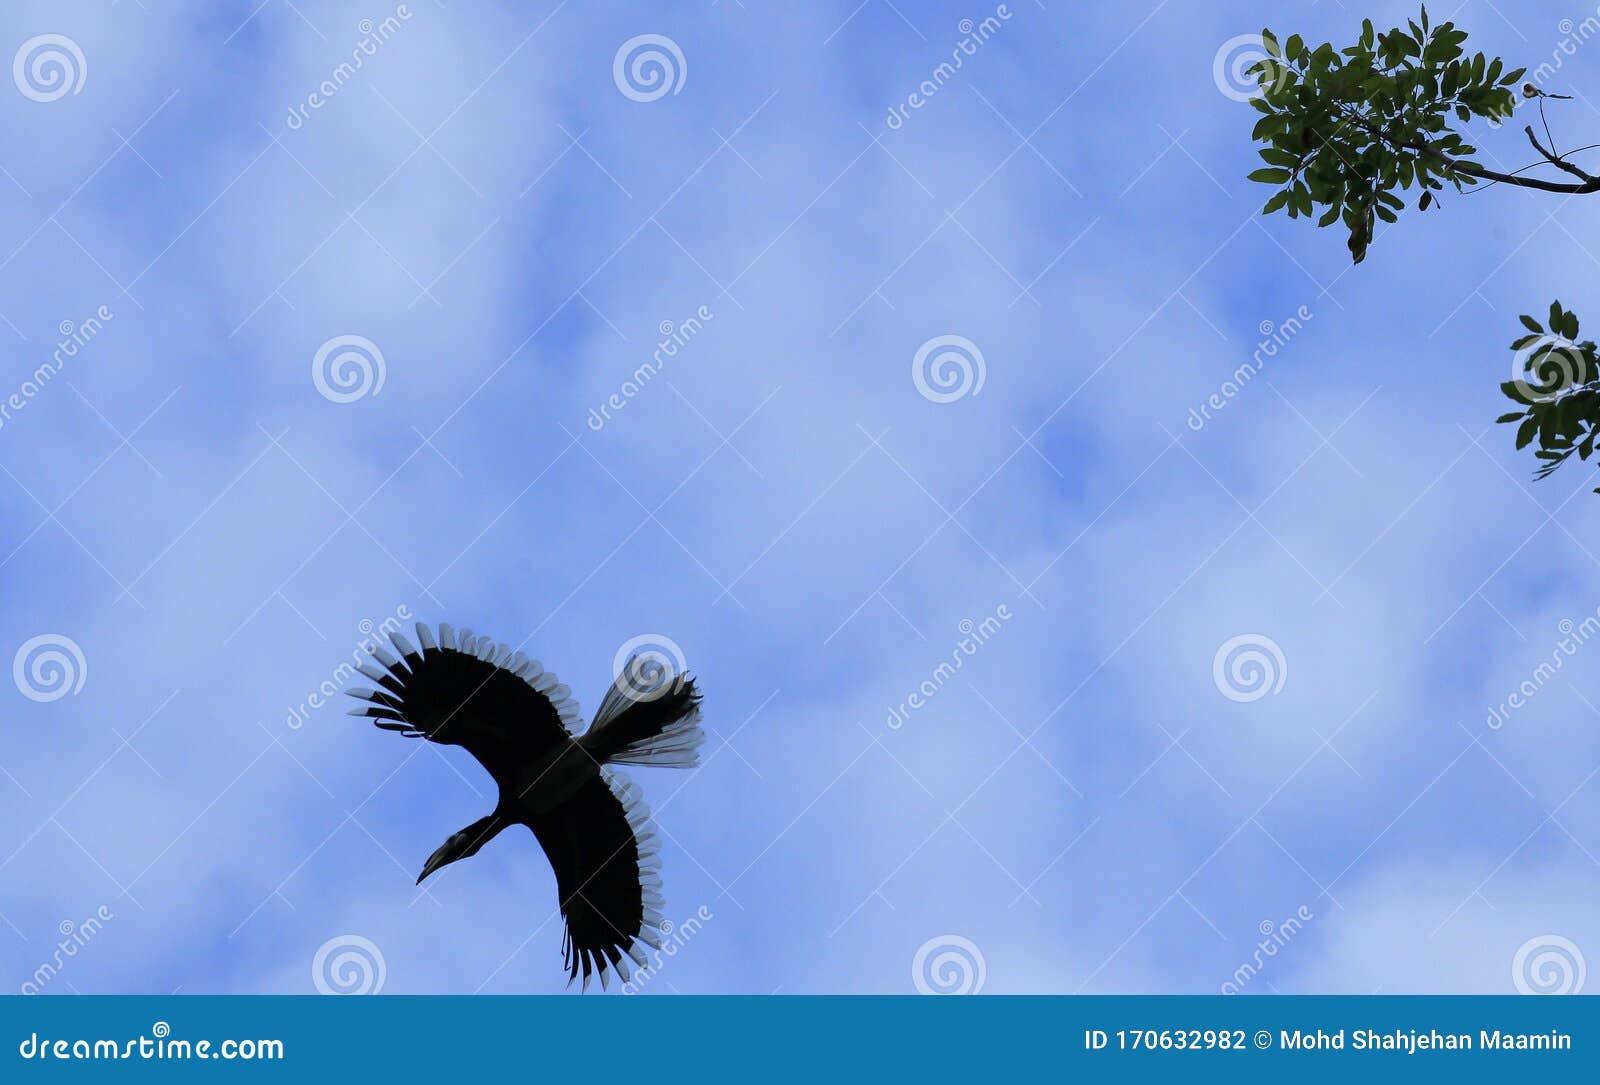 Animals Wildlife Stock Photo Image Of Rhinoceros Hornbill 170632982